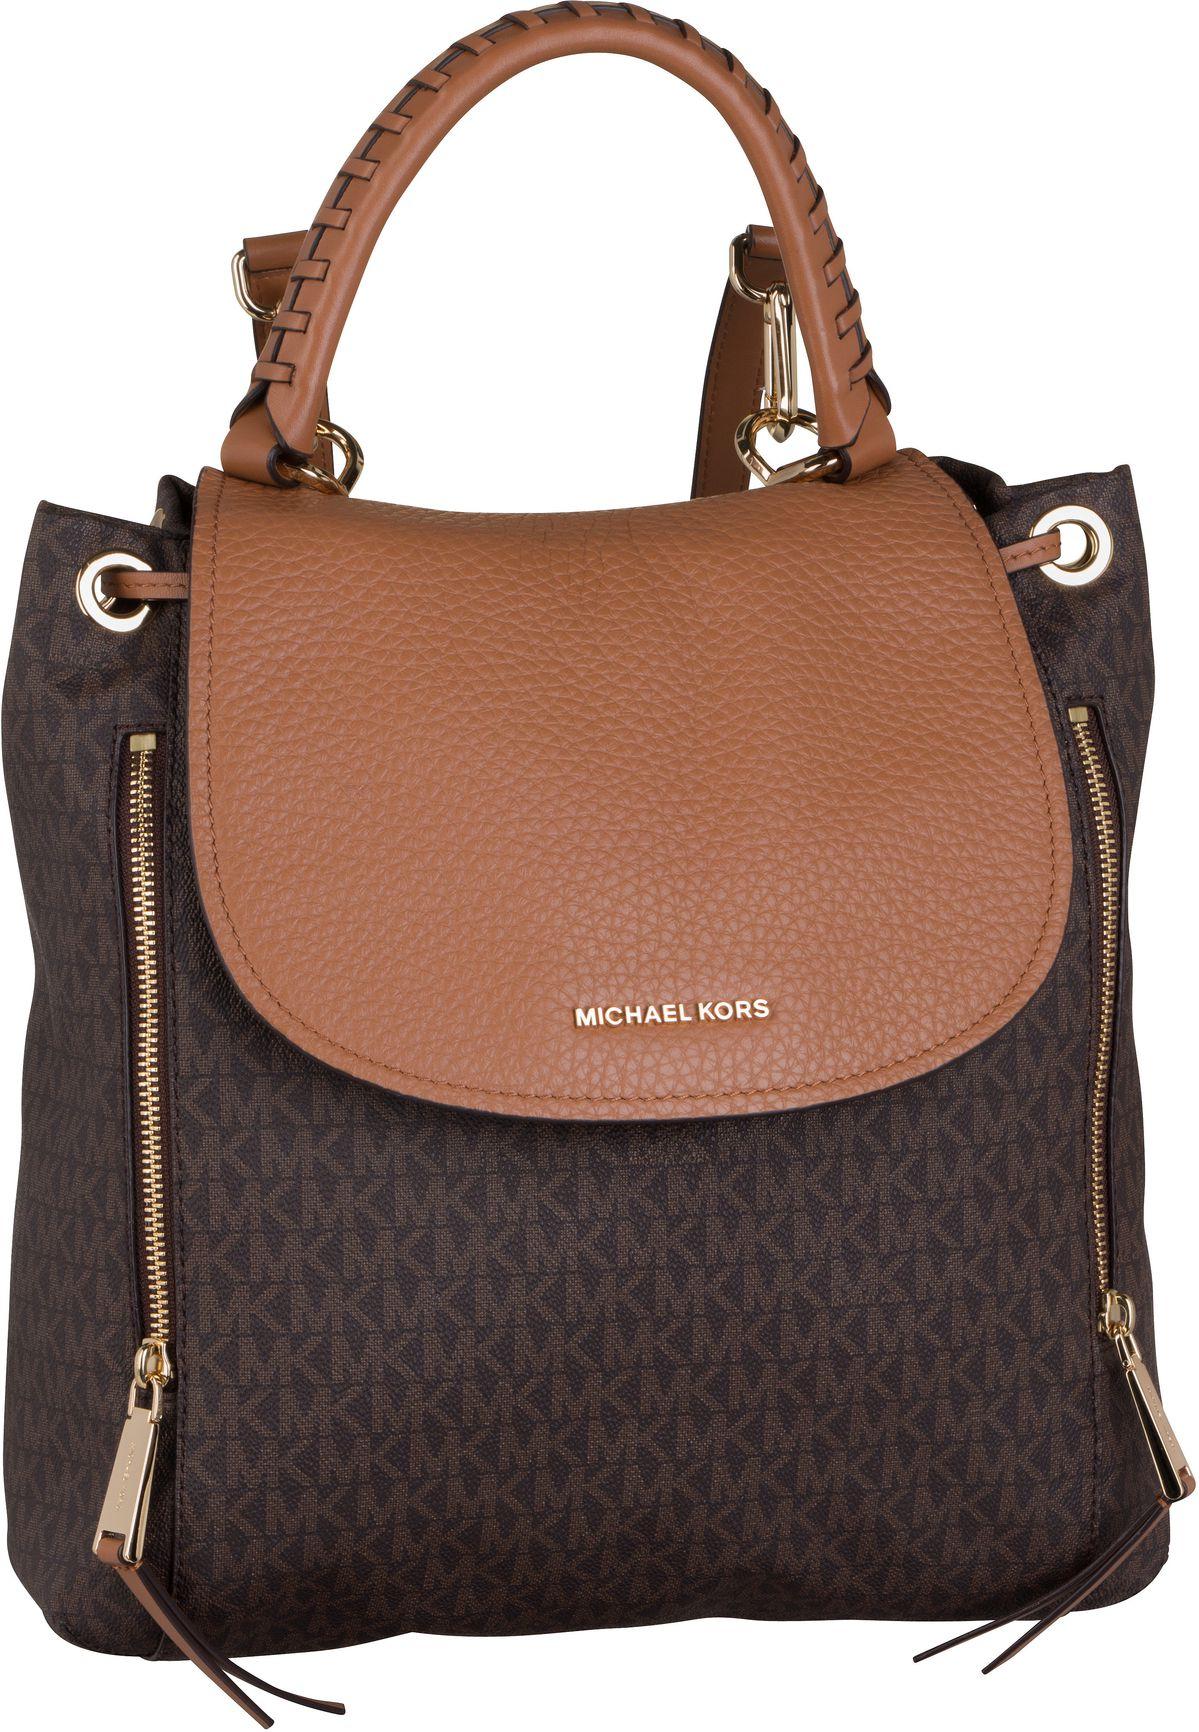 Rucksack / Daypack Viv Large Backpack MK Signature Brown/Acorn